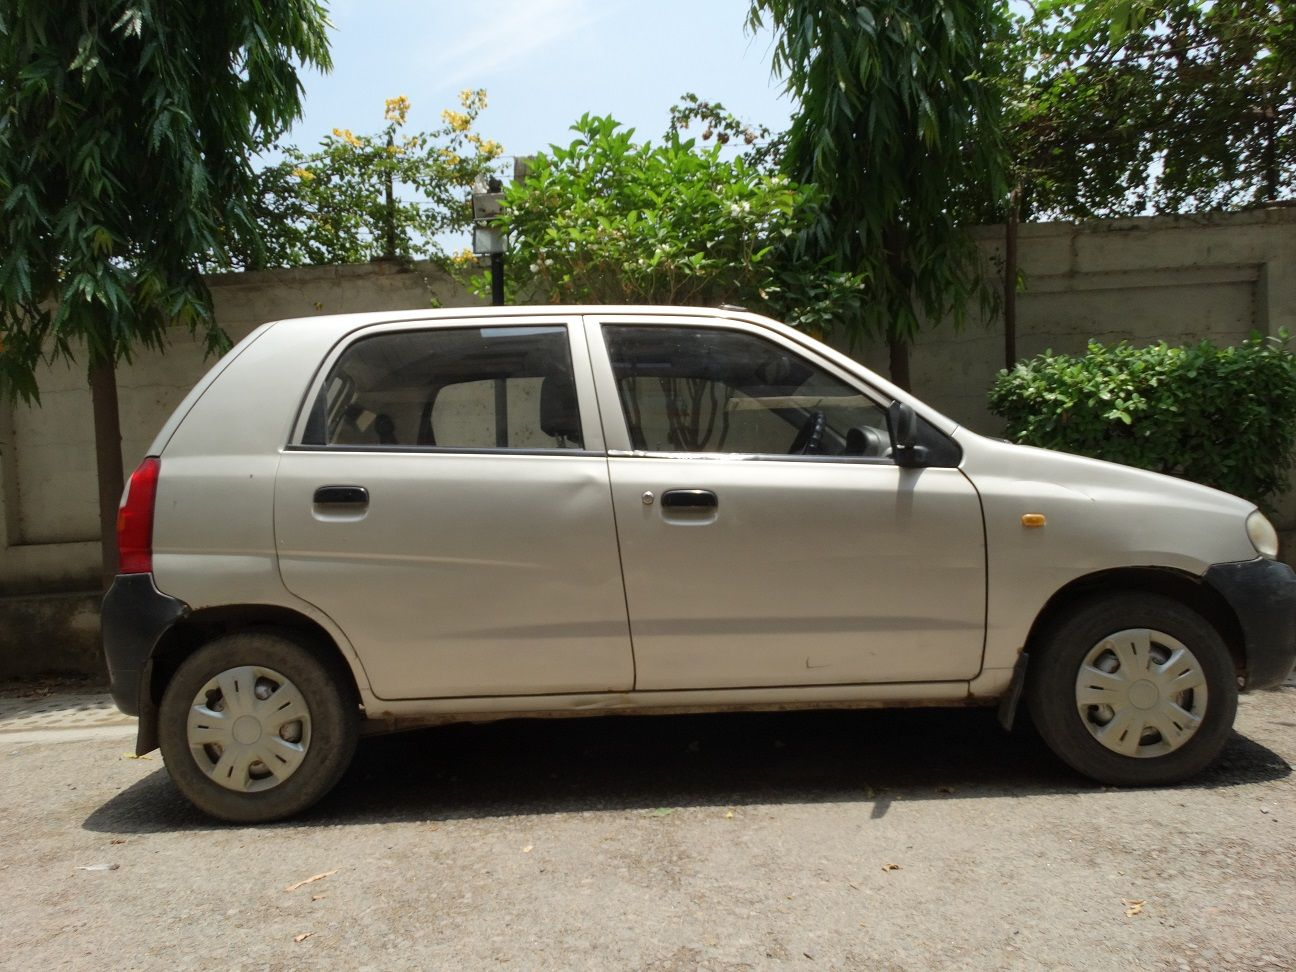 Maruti Suzuki alto 800 lx - 2005 model in Gurgaon. Visit us @ http ...